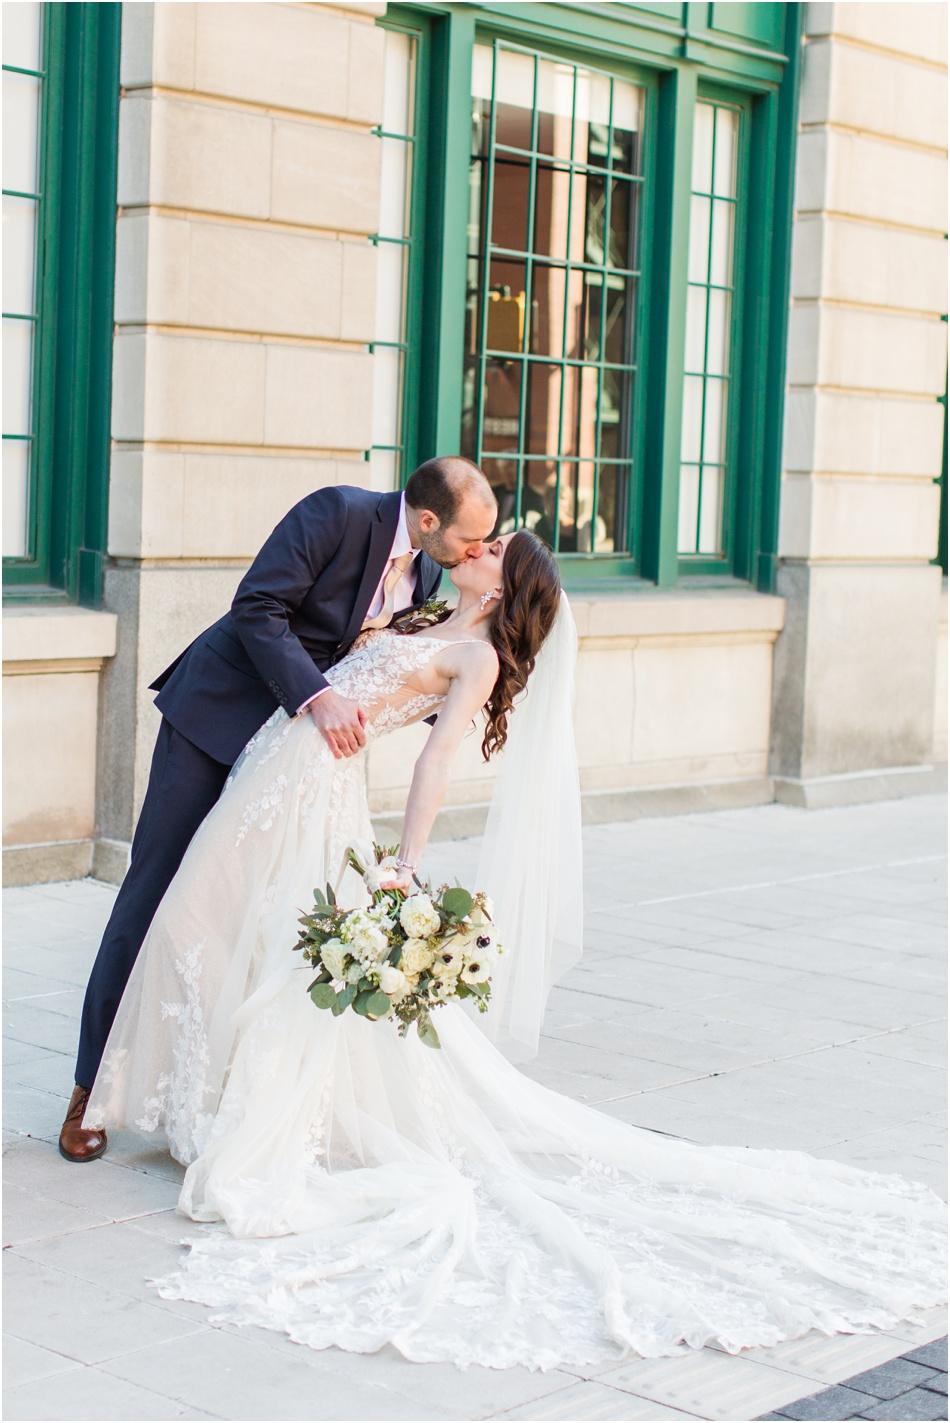 Crown-Plaza-Union-station-wedding-photography